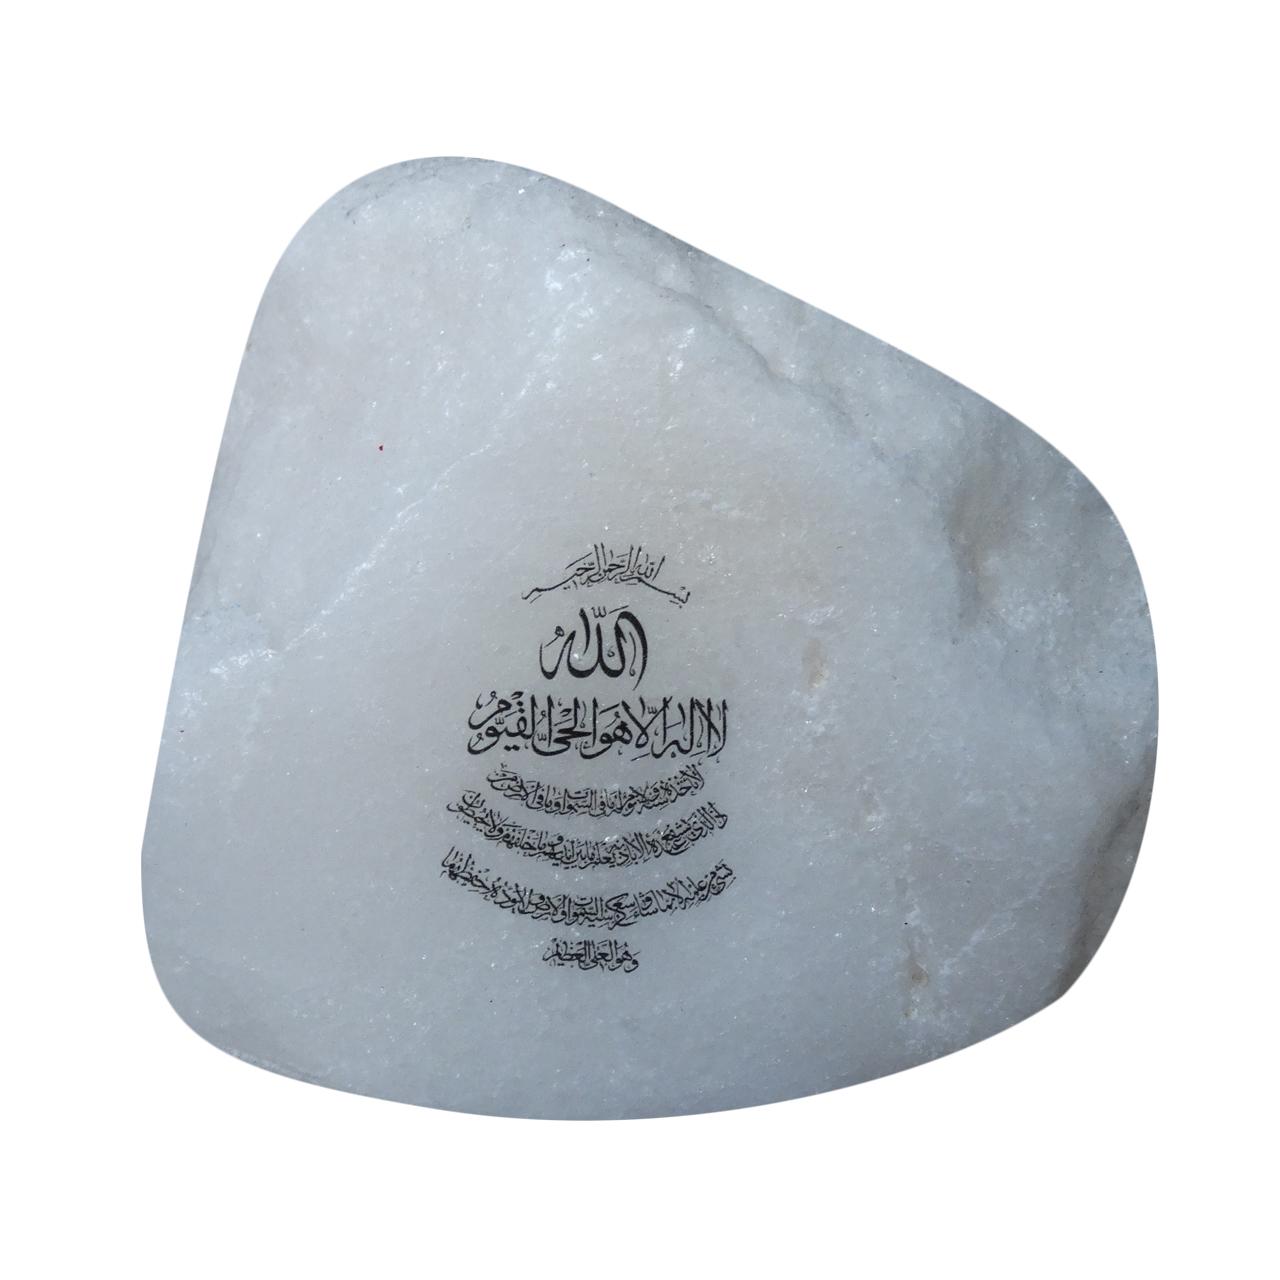 سنگ نمک دکوری طرح آیت الکرسی کد SNA02